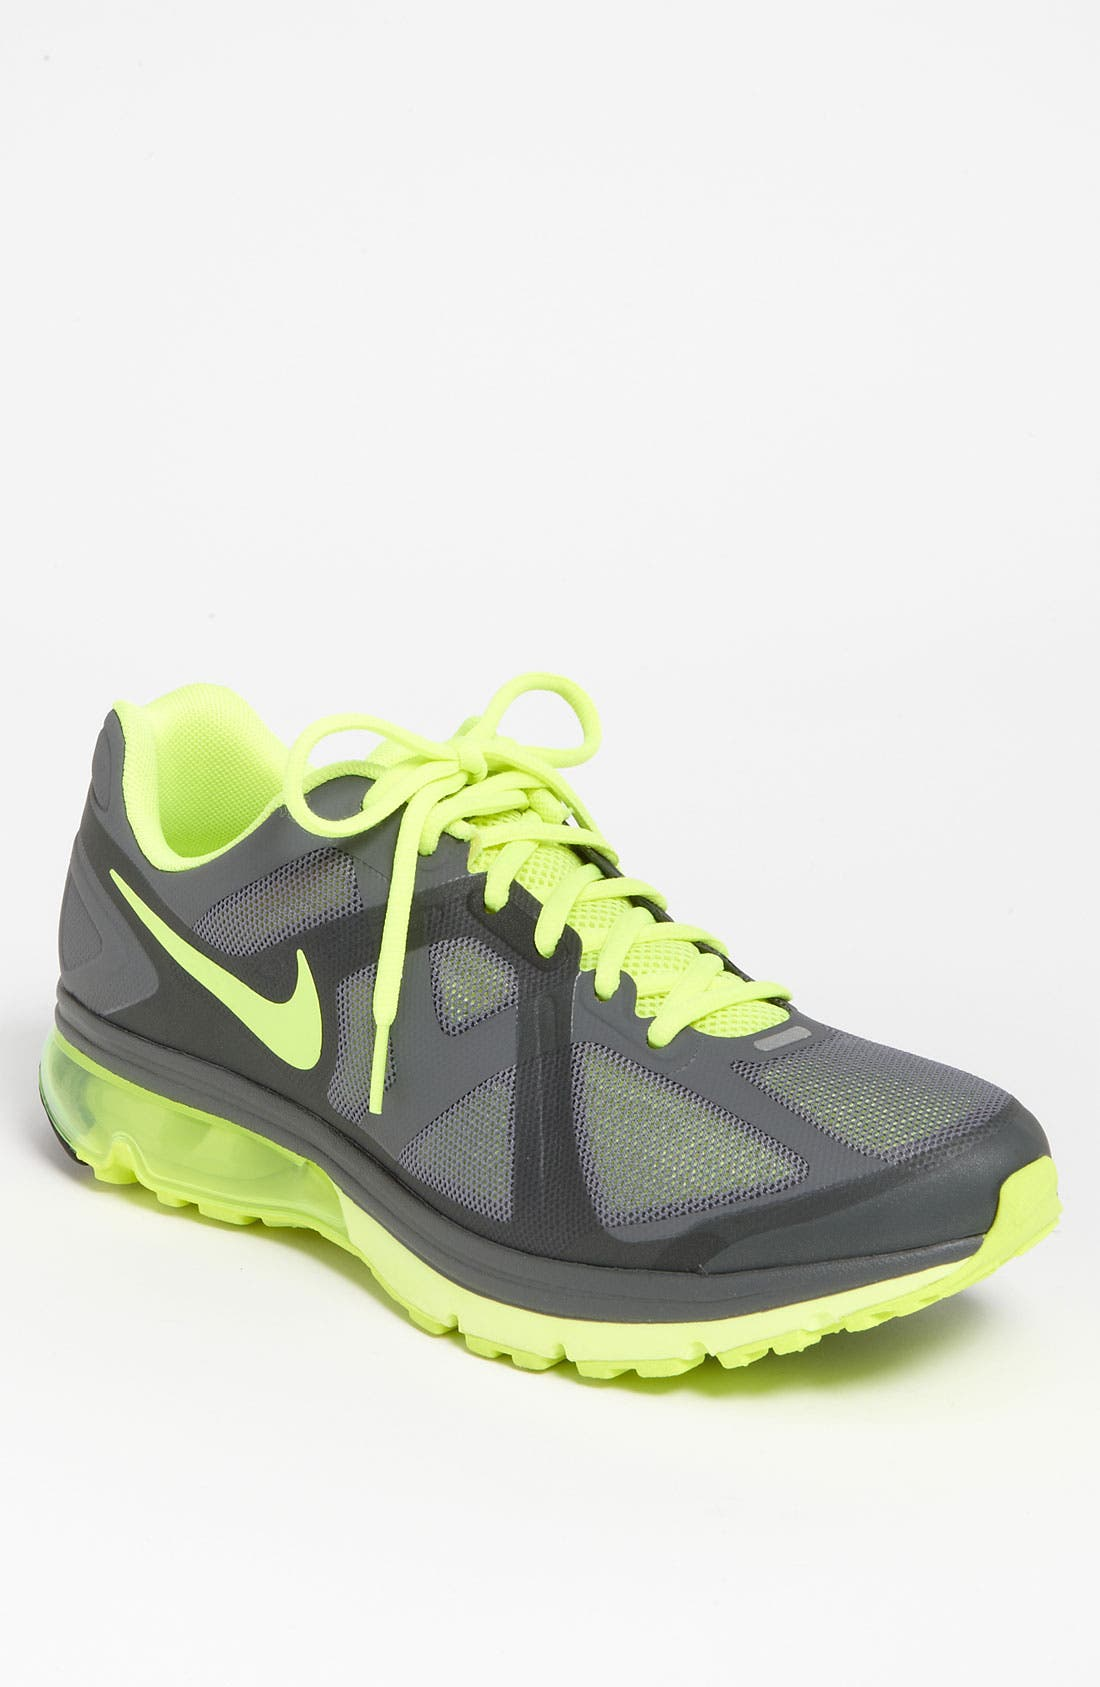 Alternate Image 1 Selected - Nike 'Air Max Excellerate+' Running Shoe (Men)